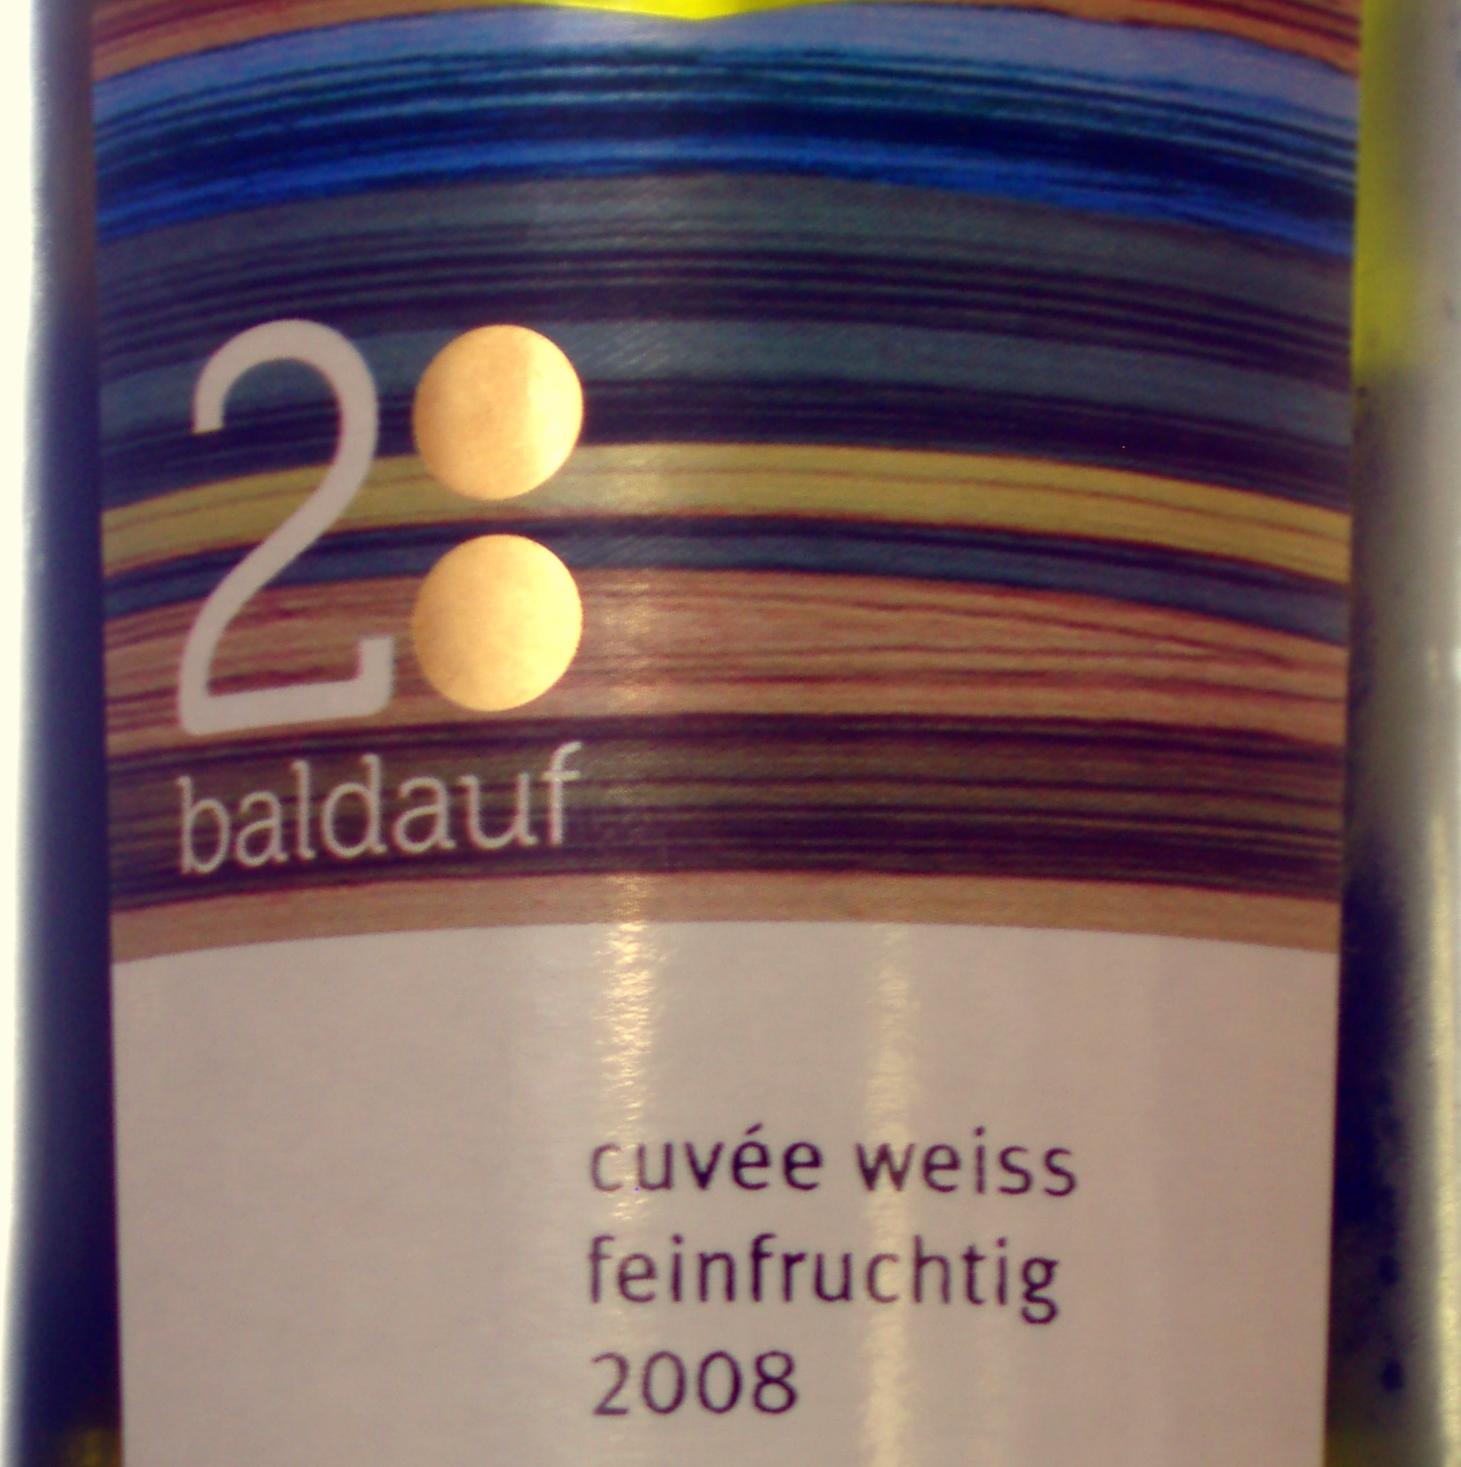 2008 Baldauf Cuvee weiss feinfruchtig thumb